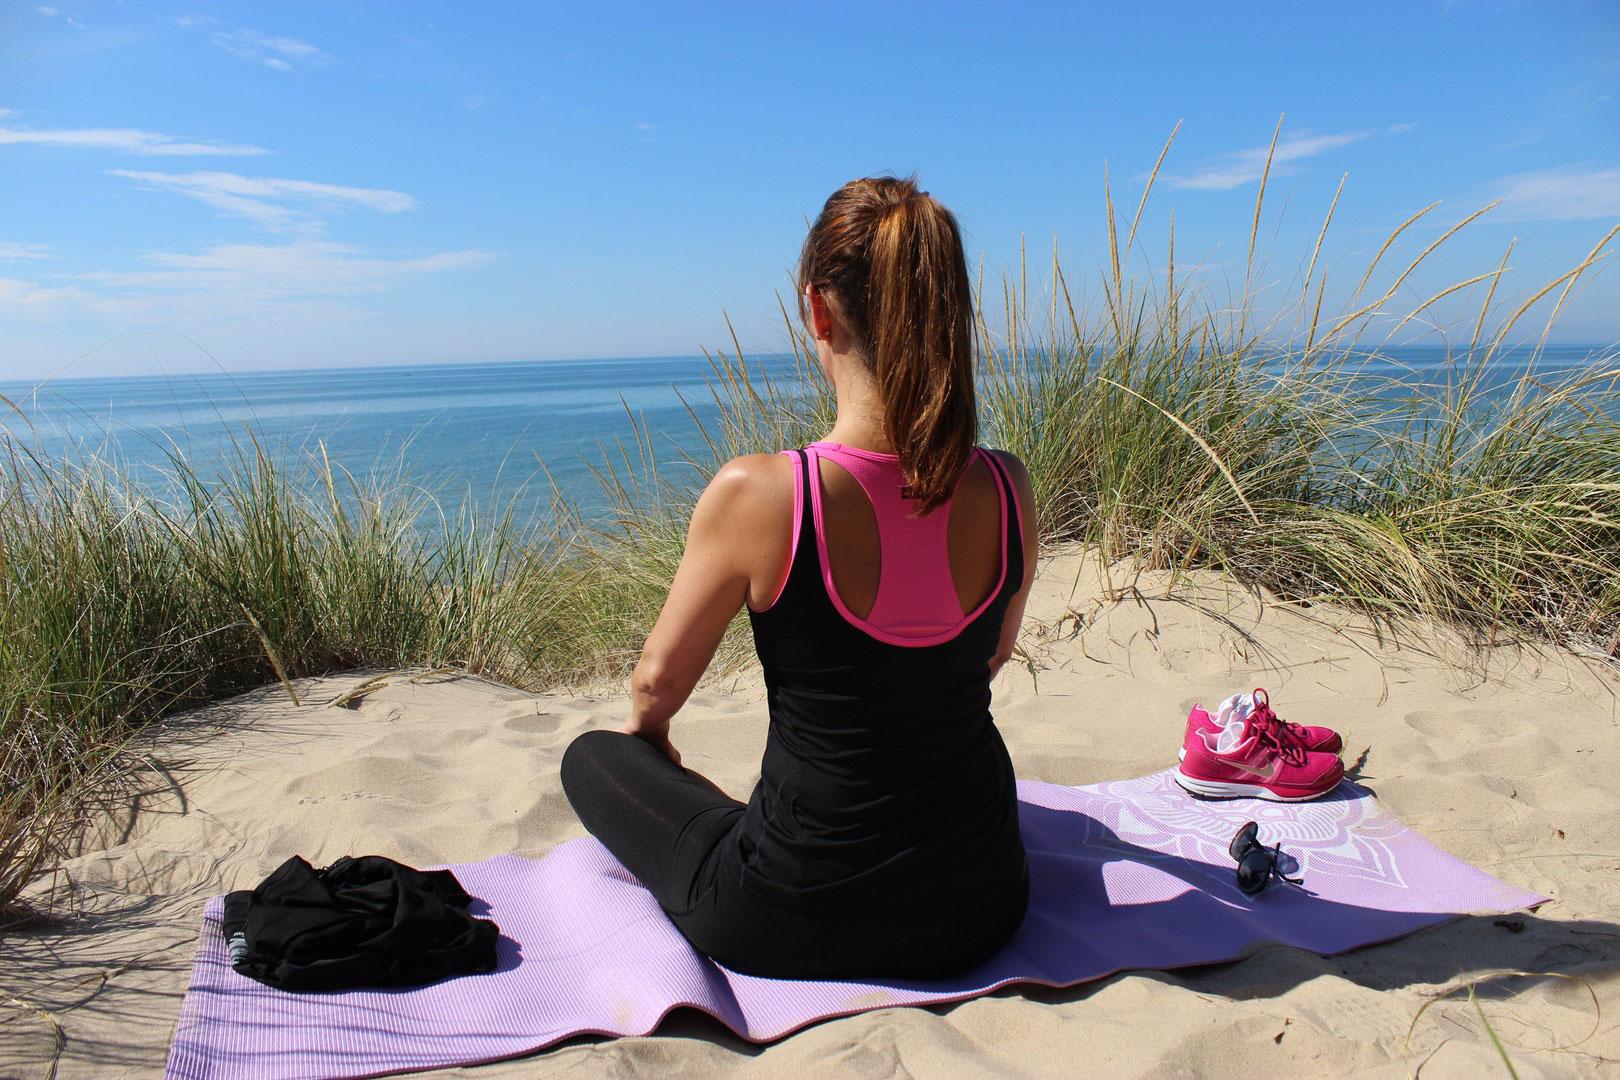 Relaxes body internally and externally doing yoga